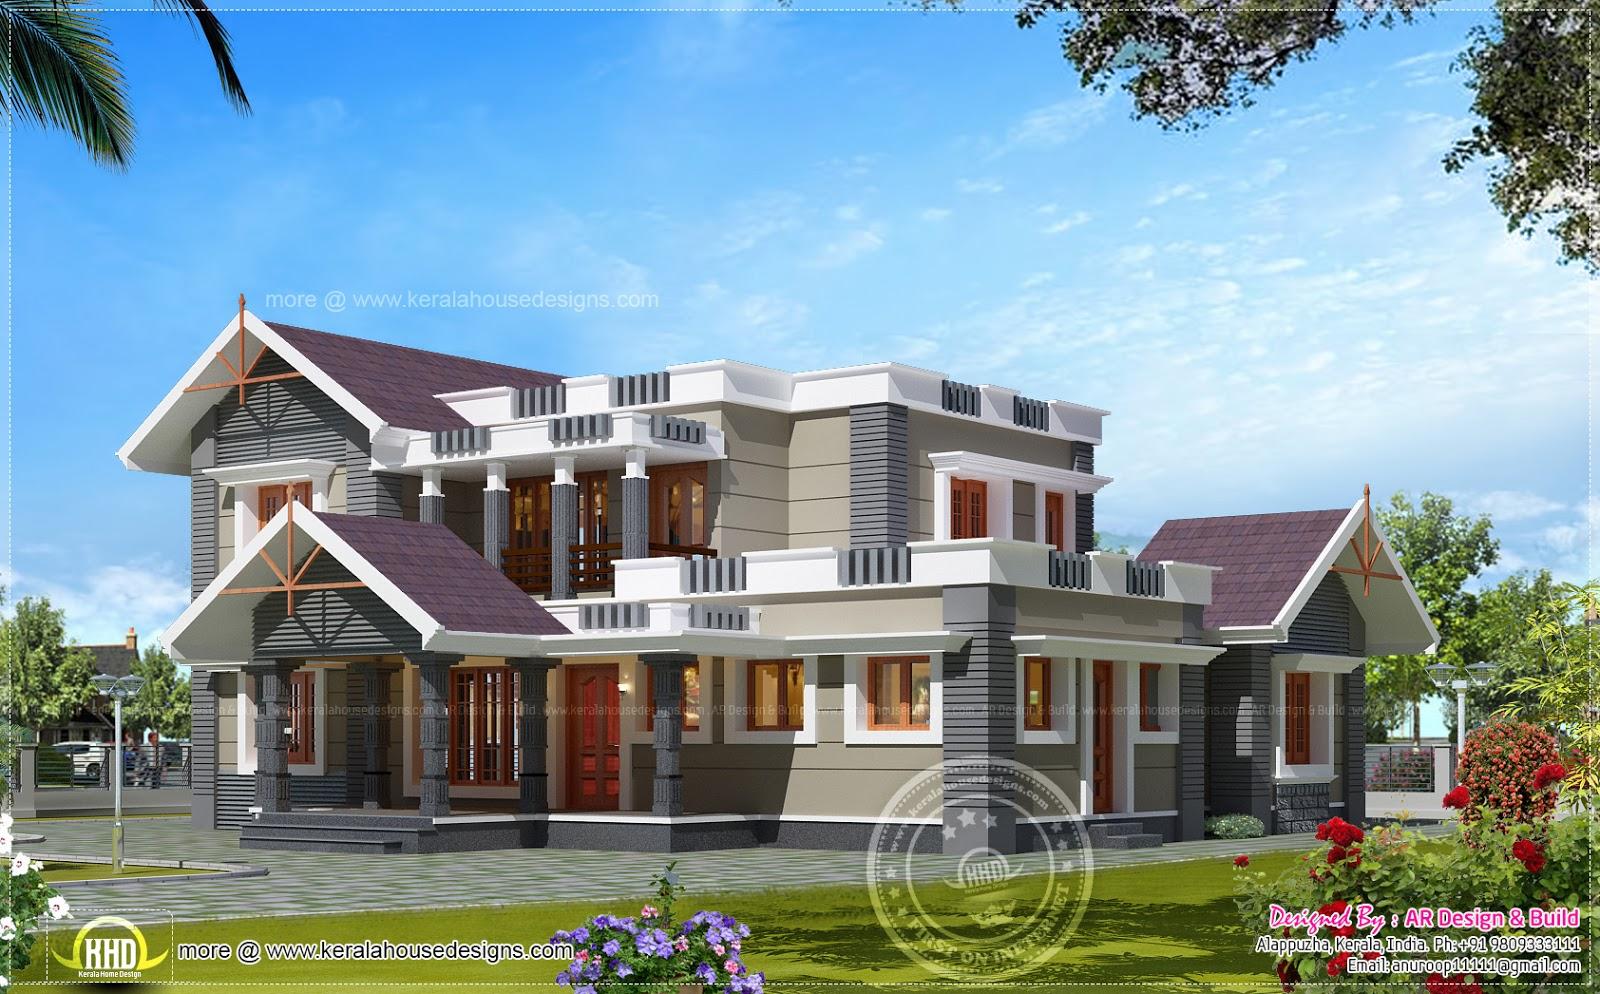 bhk house exterior design sq feet home kerala plans kerala home plan elevation sq ft kerala home design